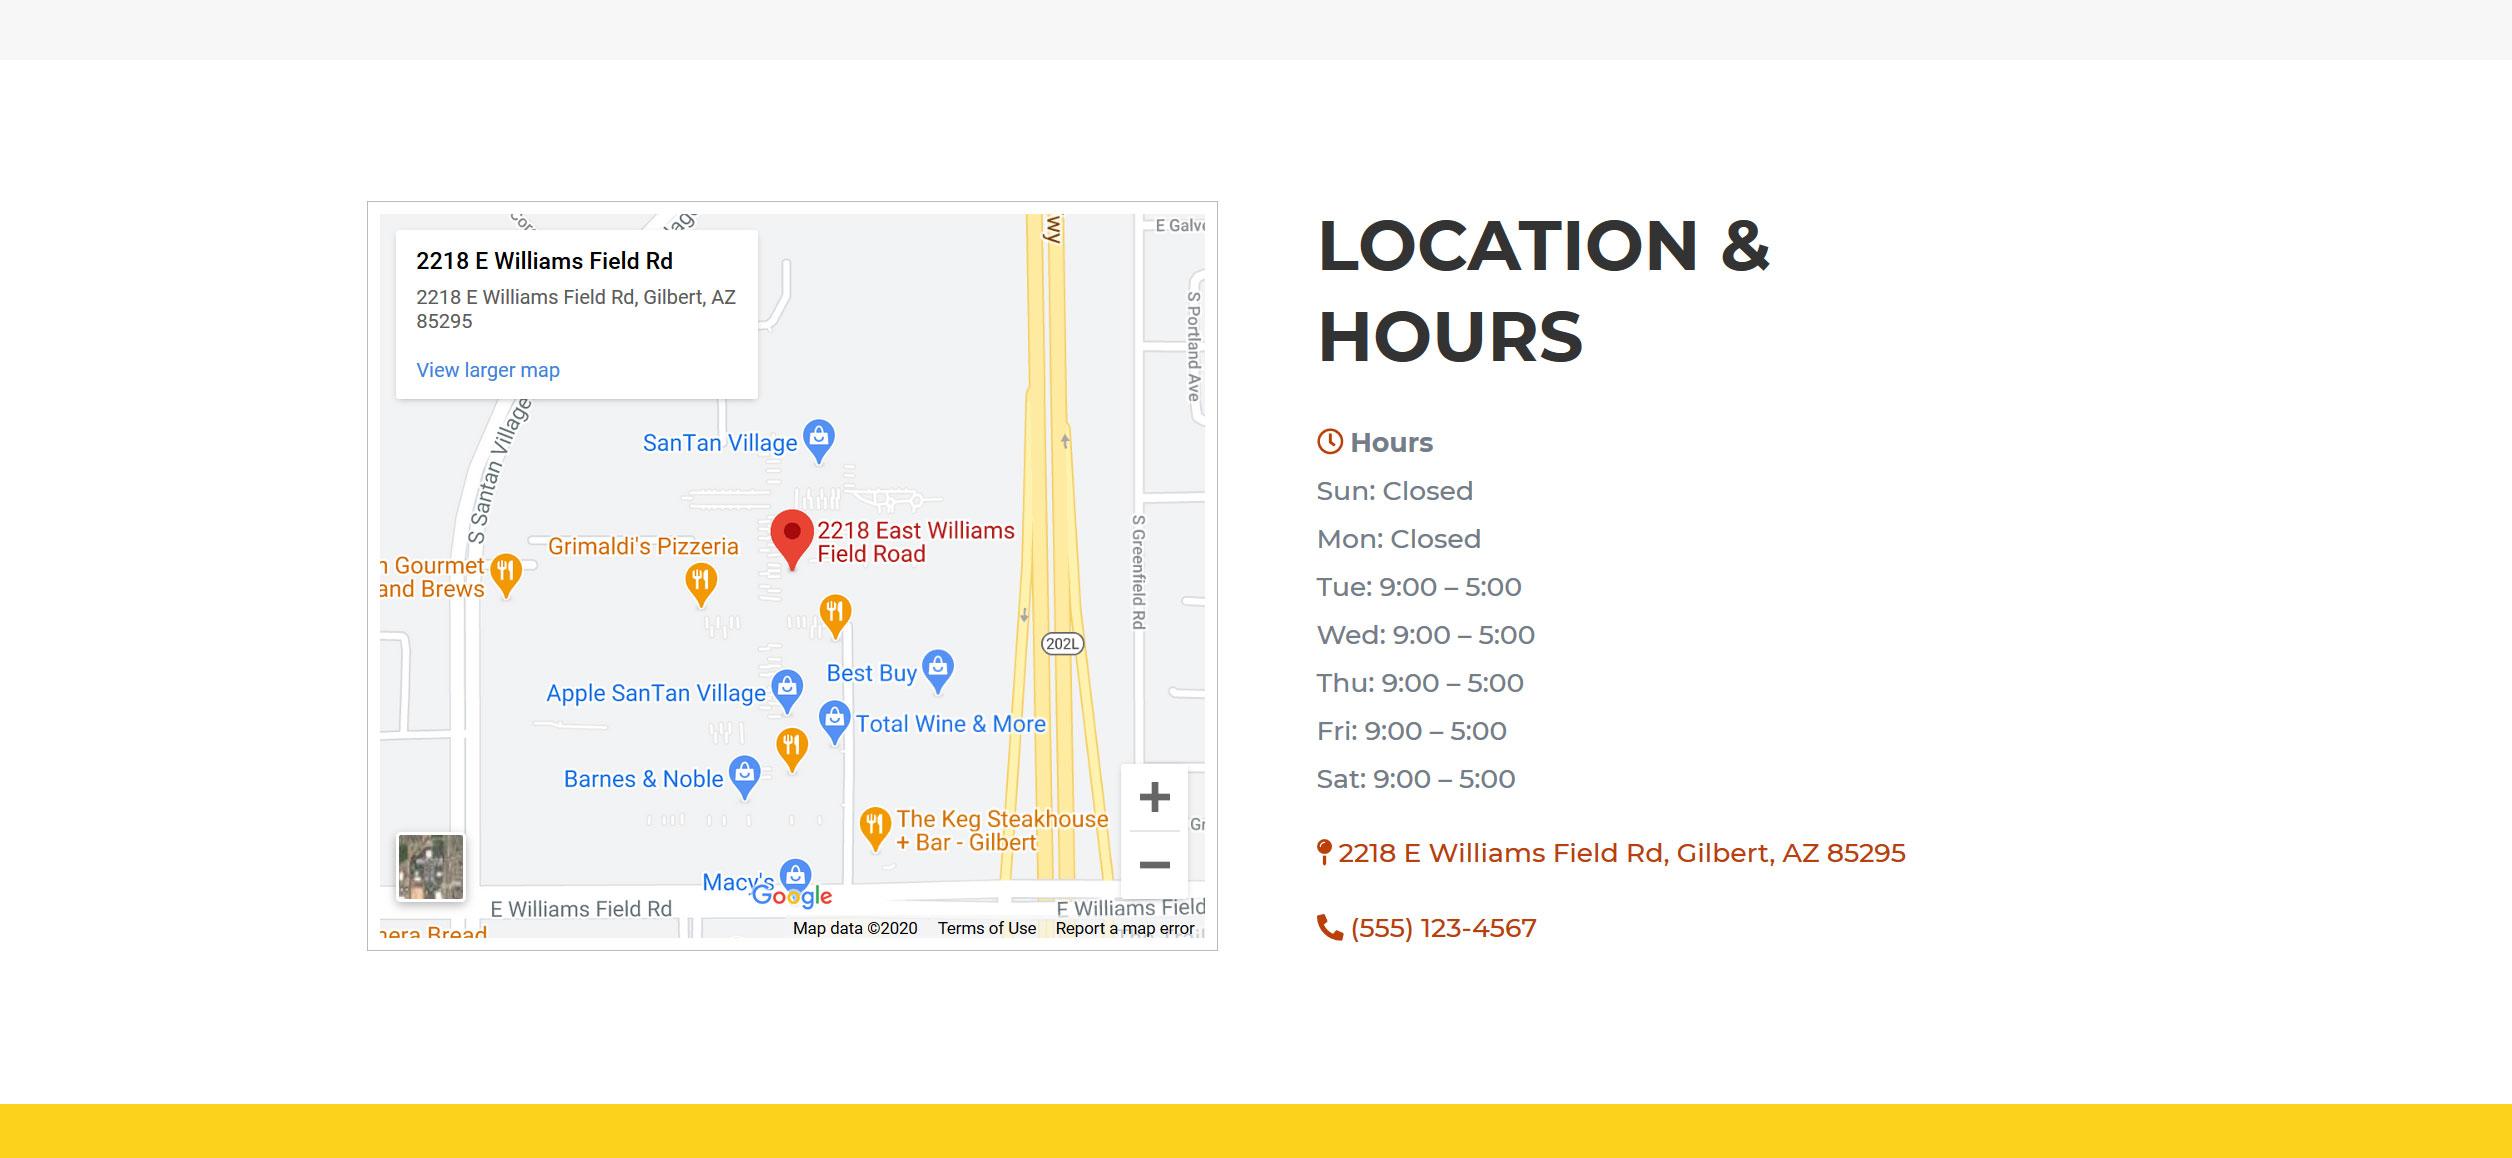 Website for Hairdressers v1 - Map, Location & Hours